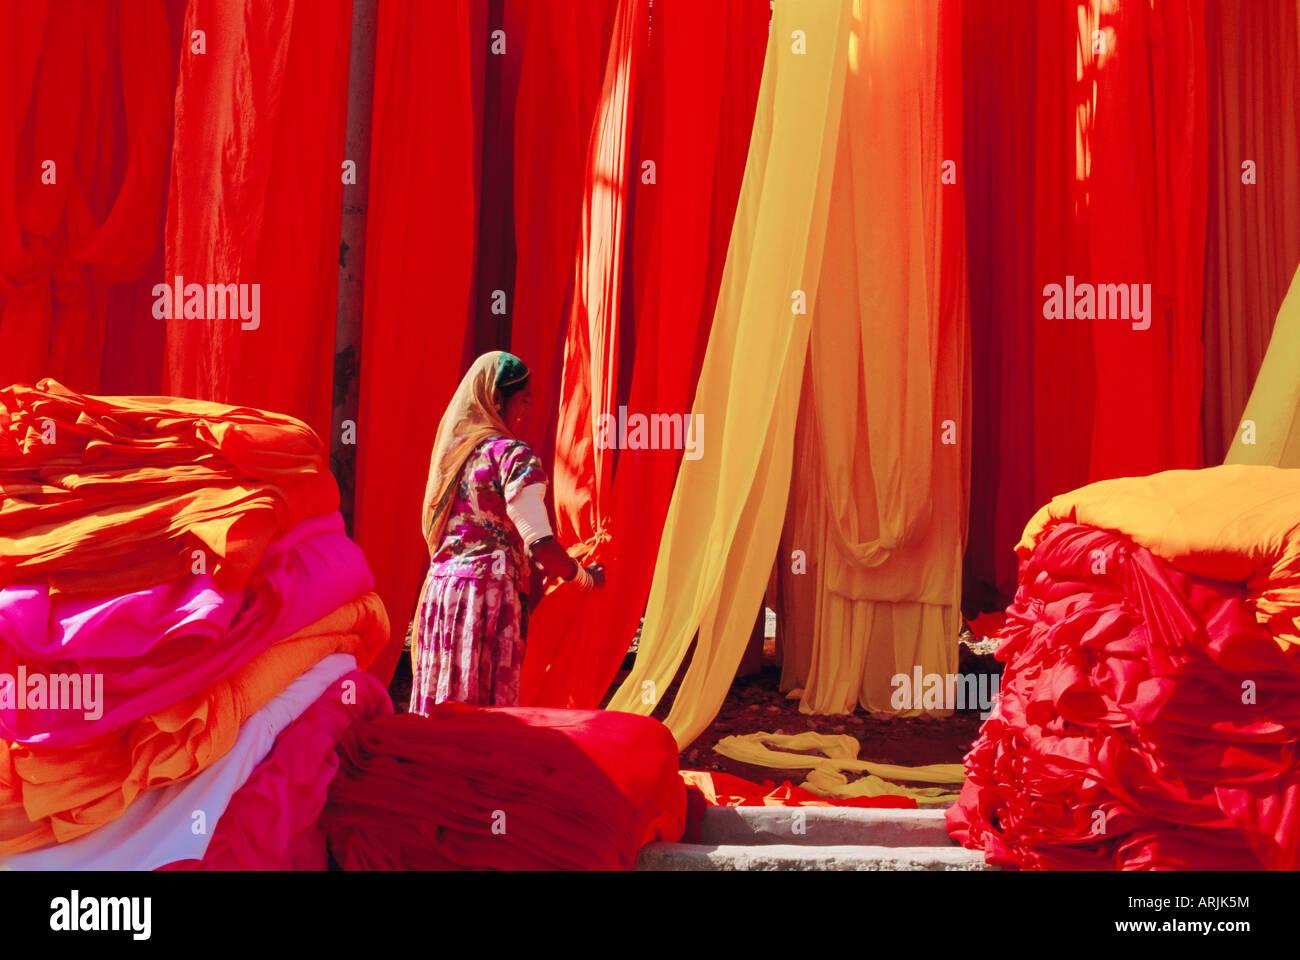 Sari, fábrica de prendas de vestir, Rajasthan, India Imagen De Stock